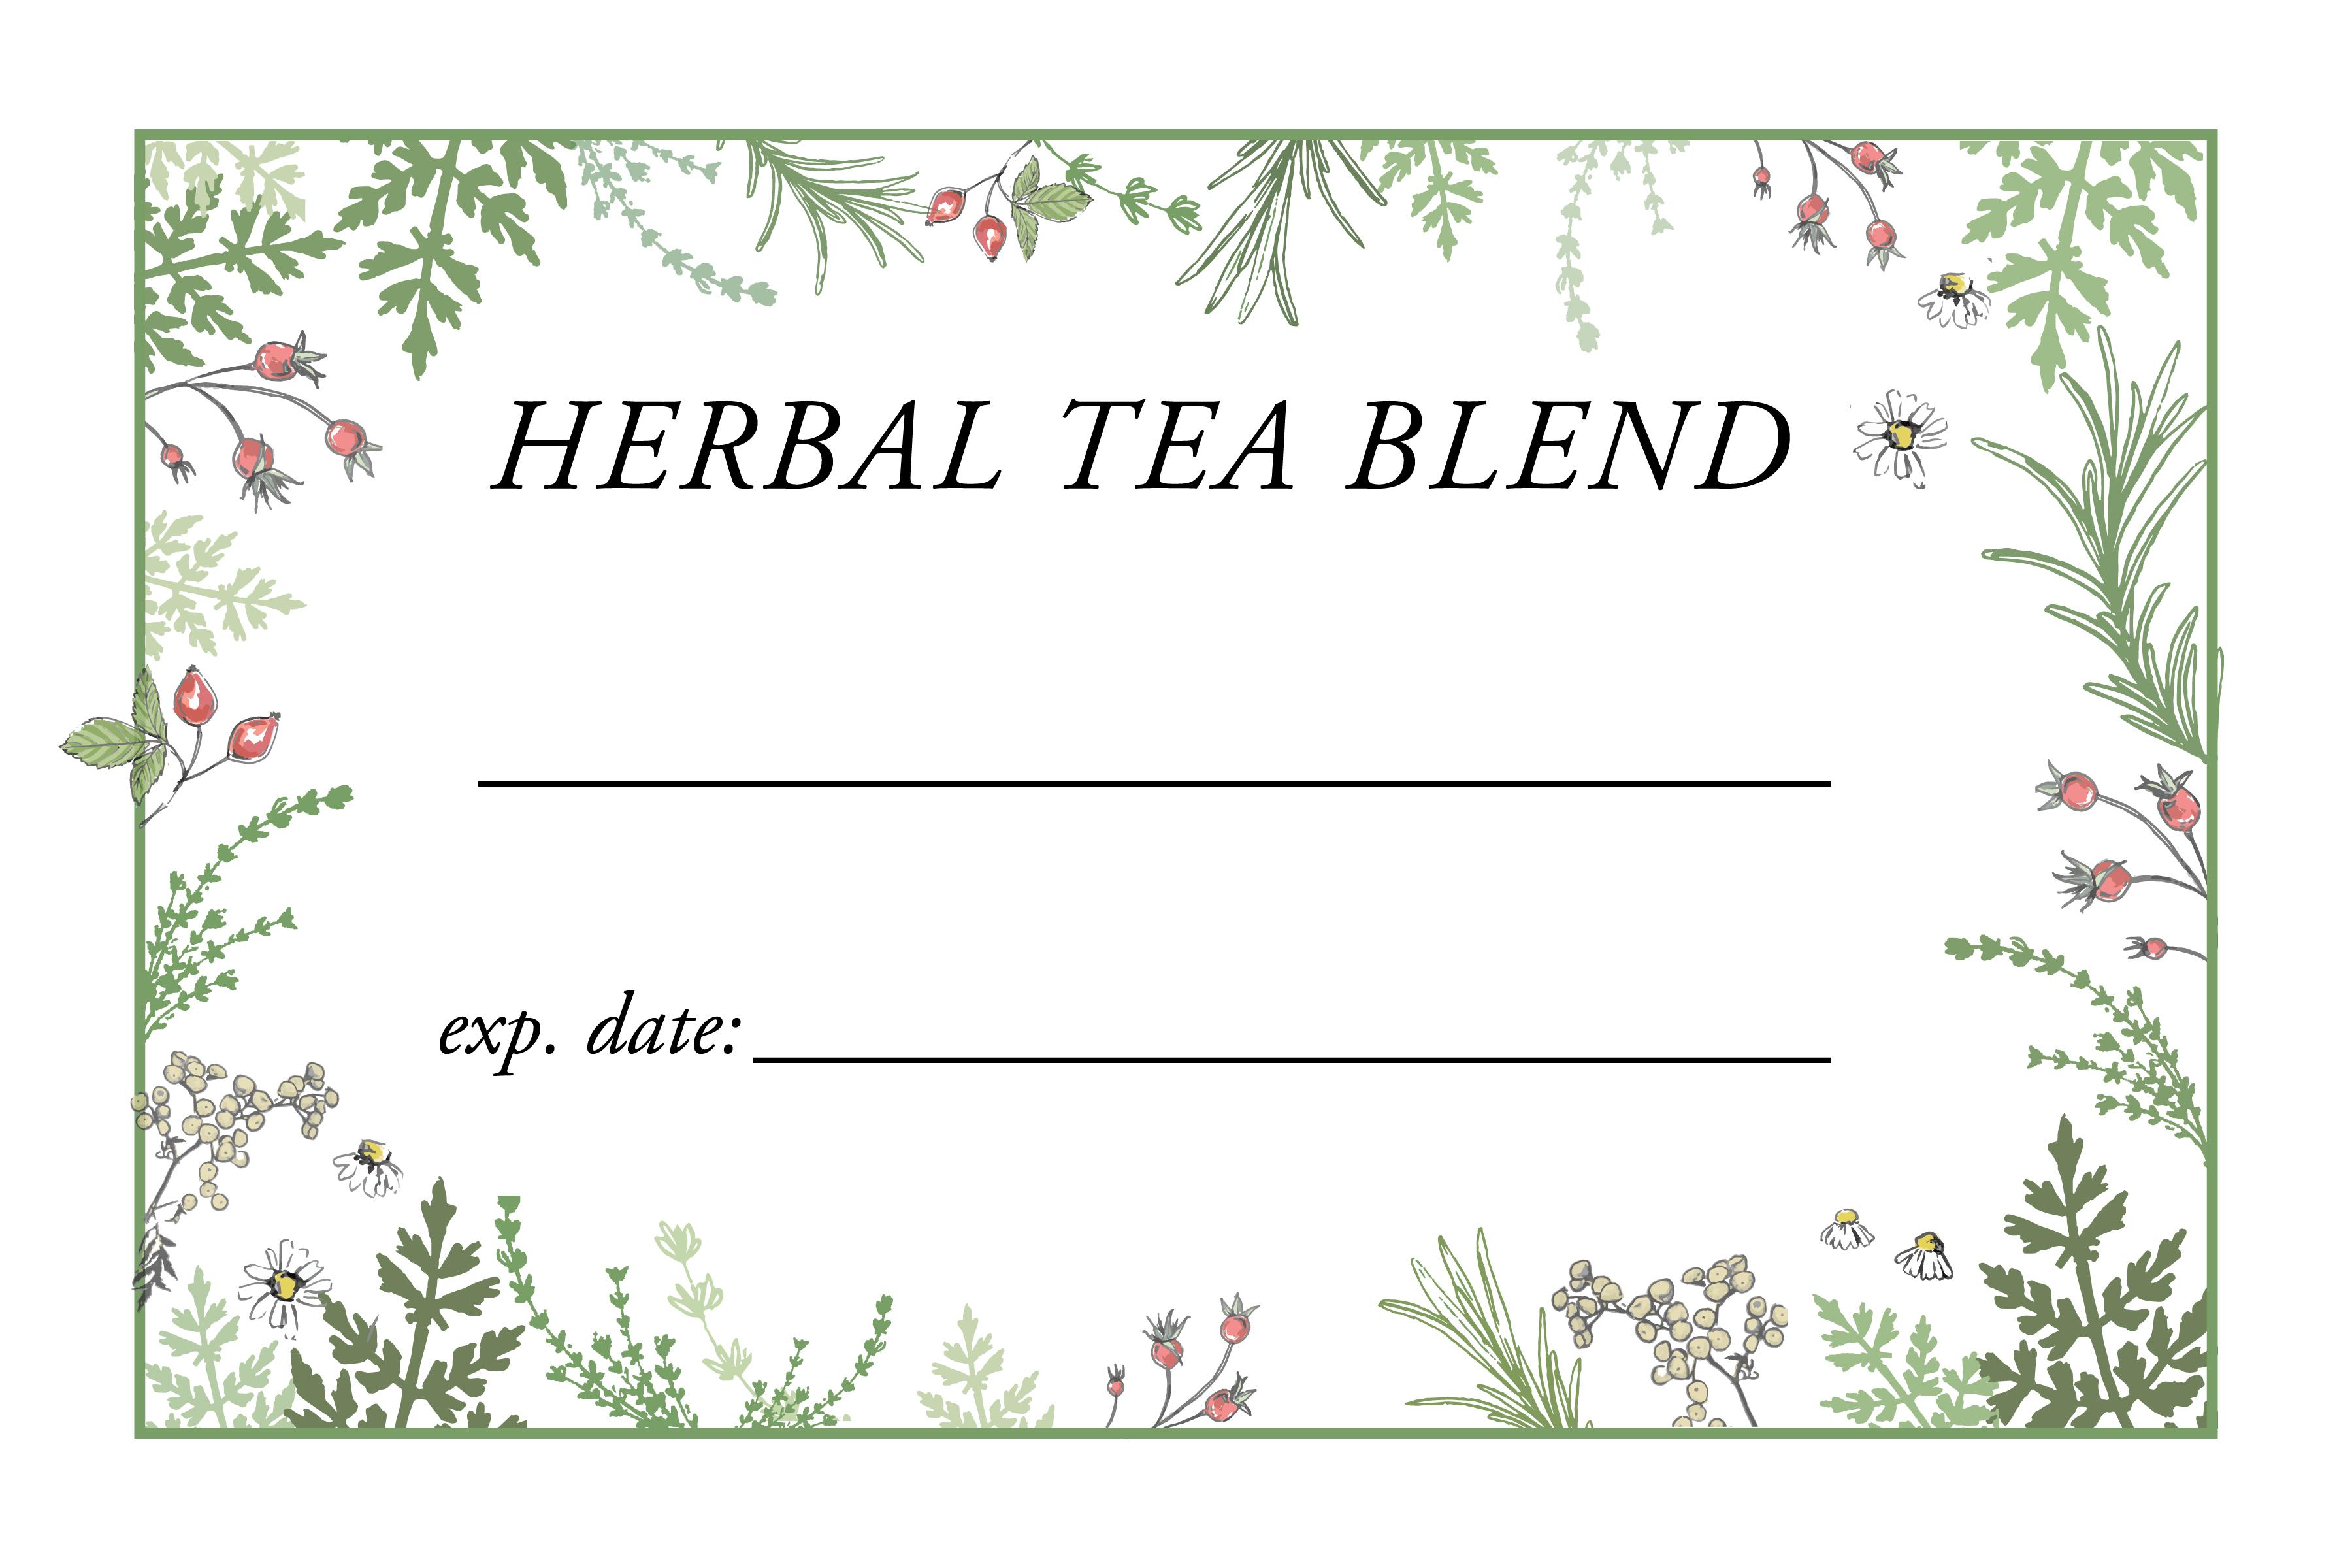 Herbal Tea Blend Label Greens4